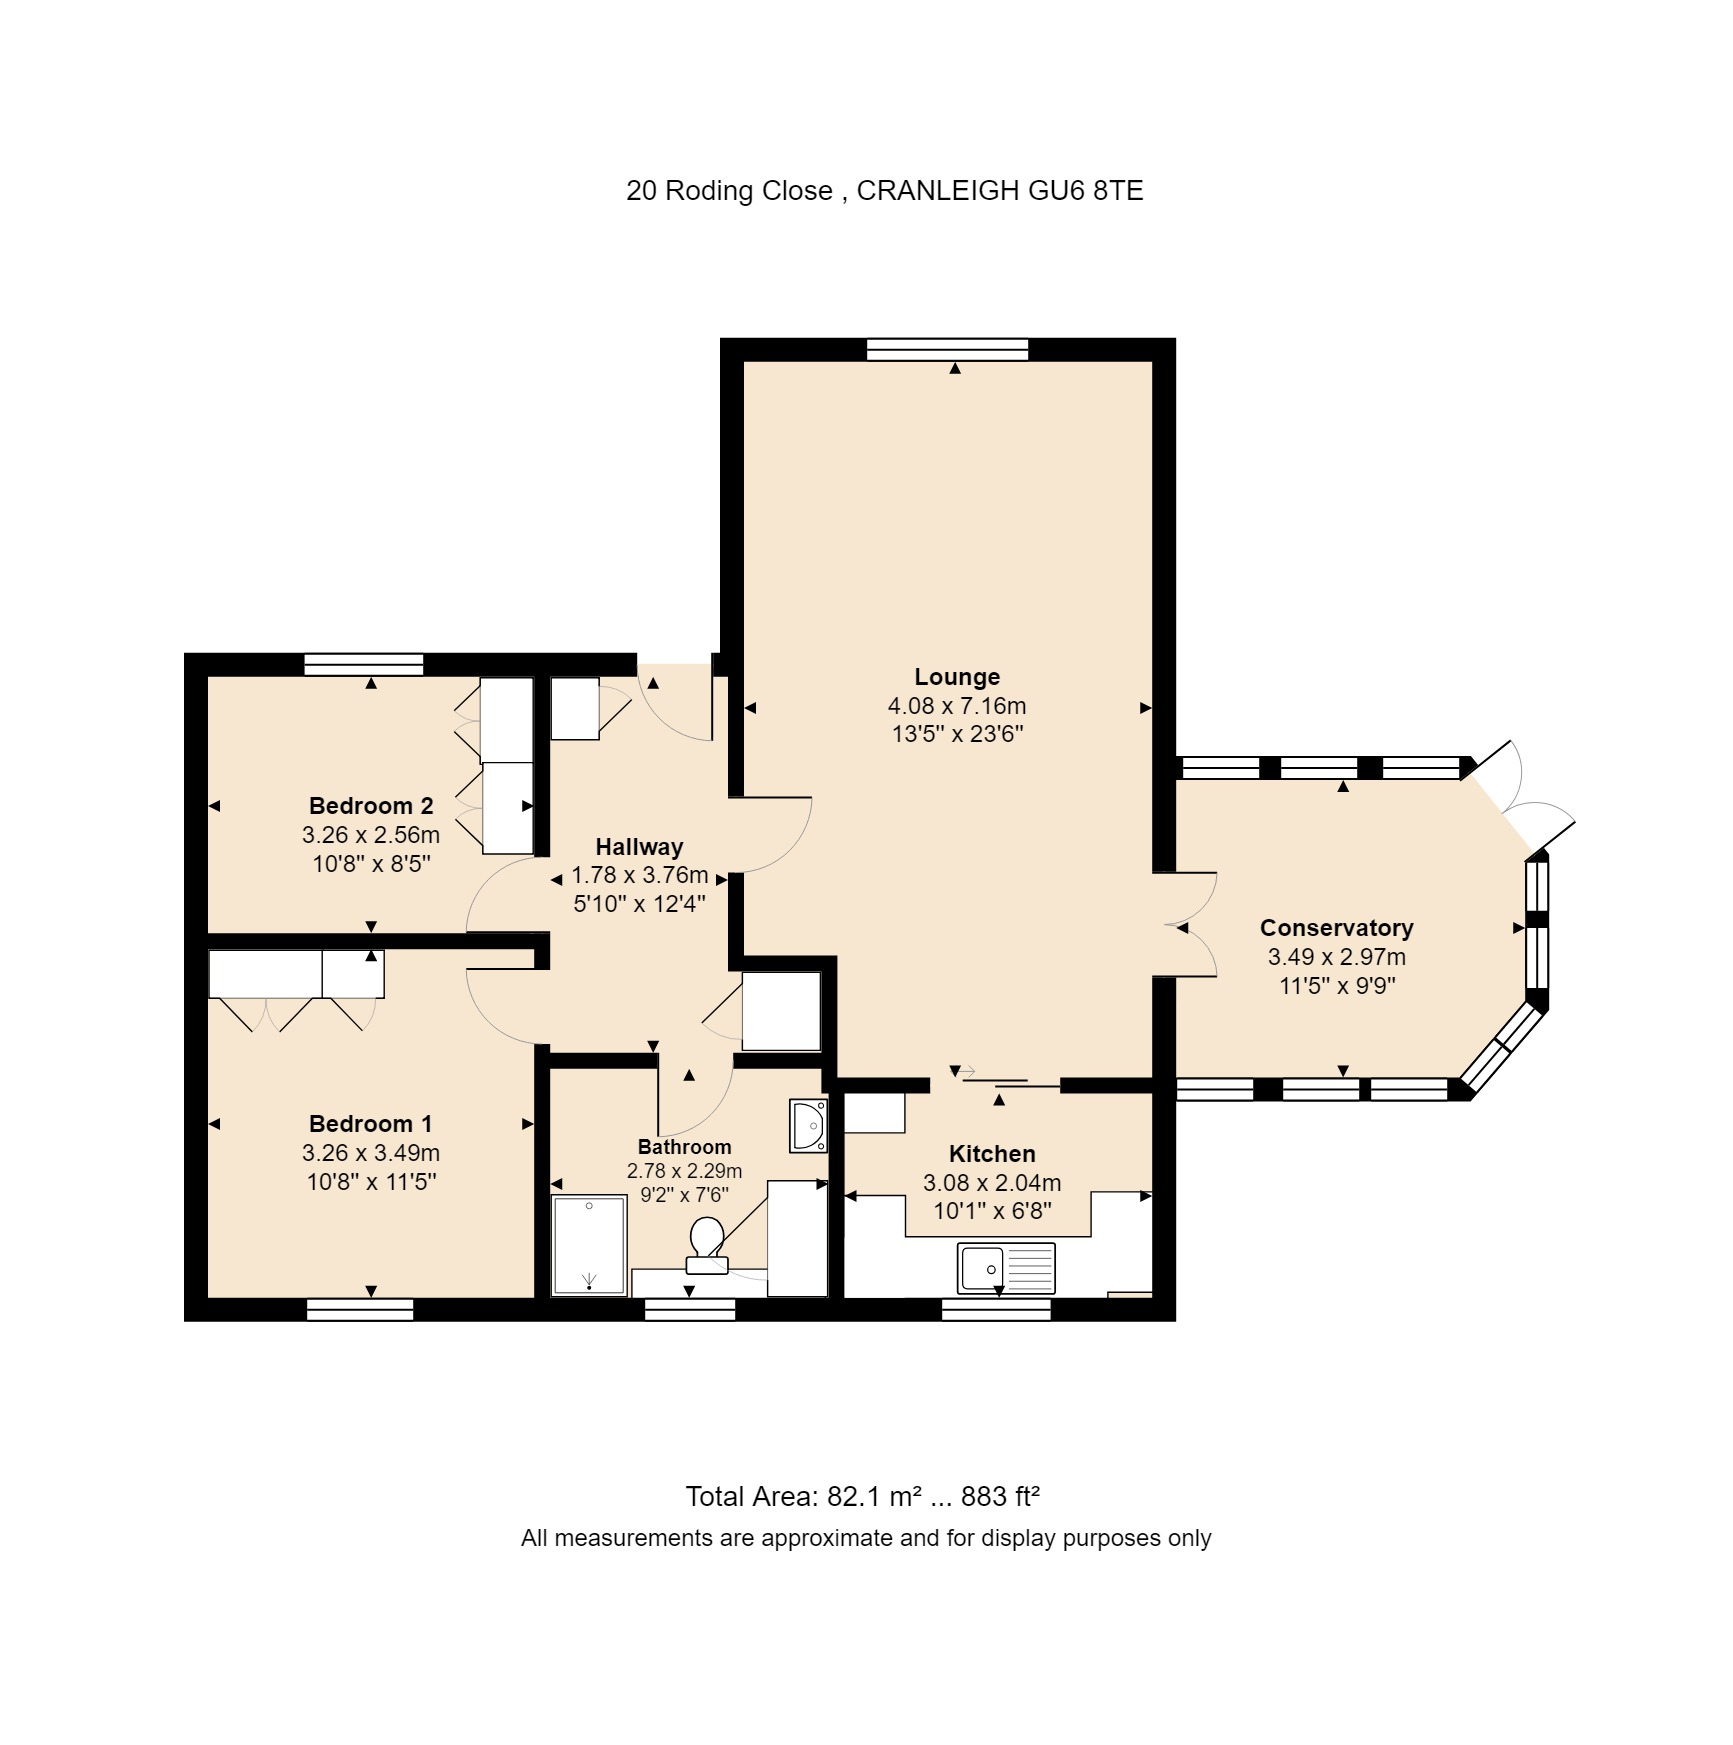 20 Roding Close Floorplan